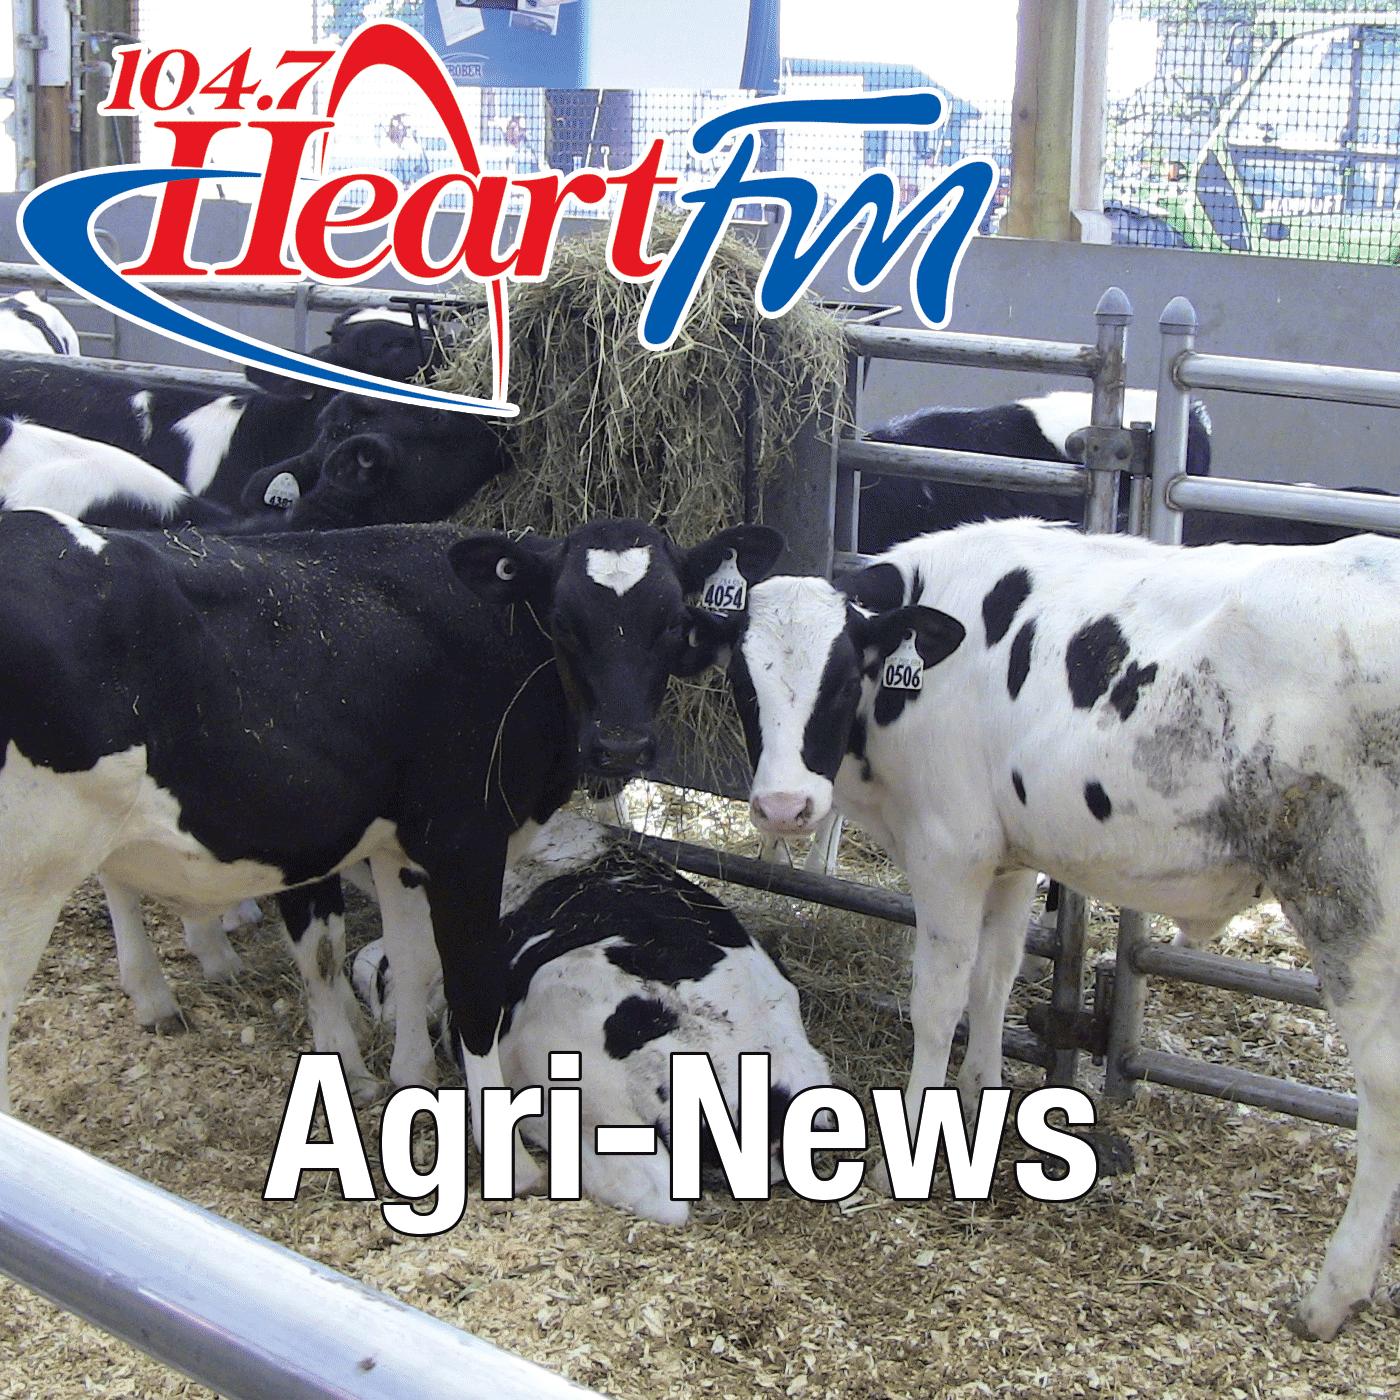 Oxford County Agri-News